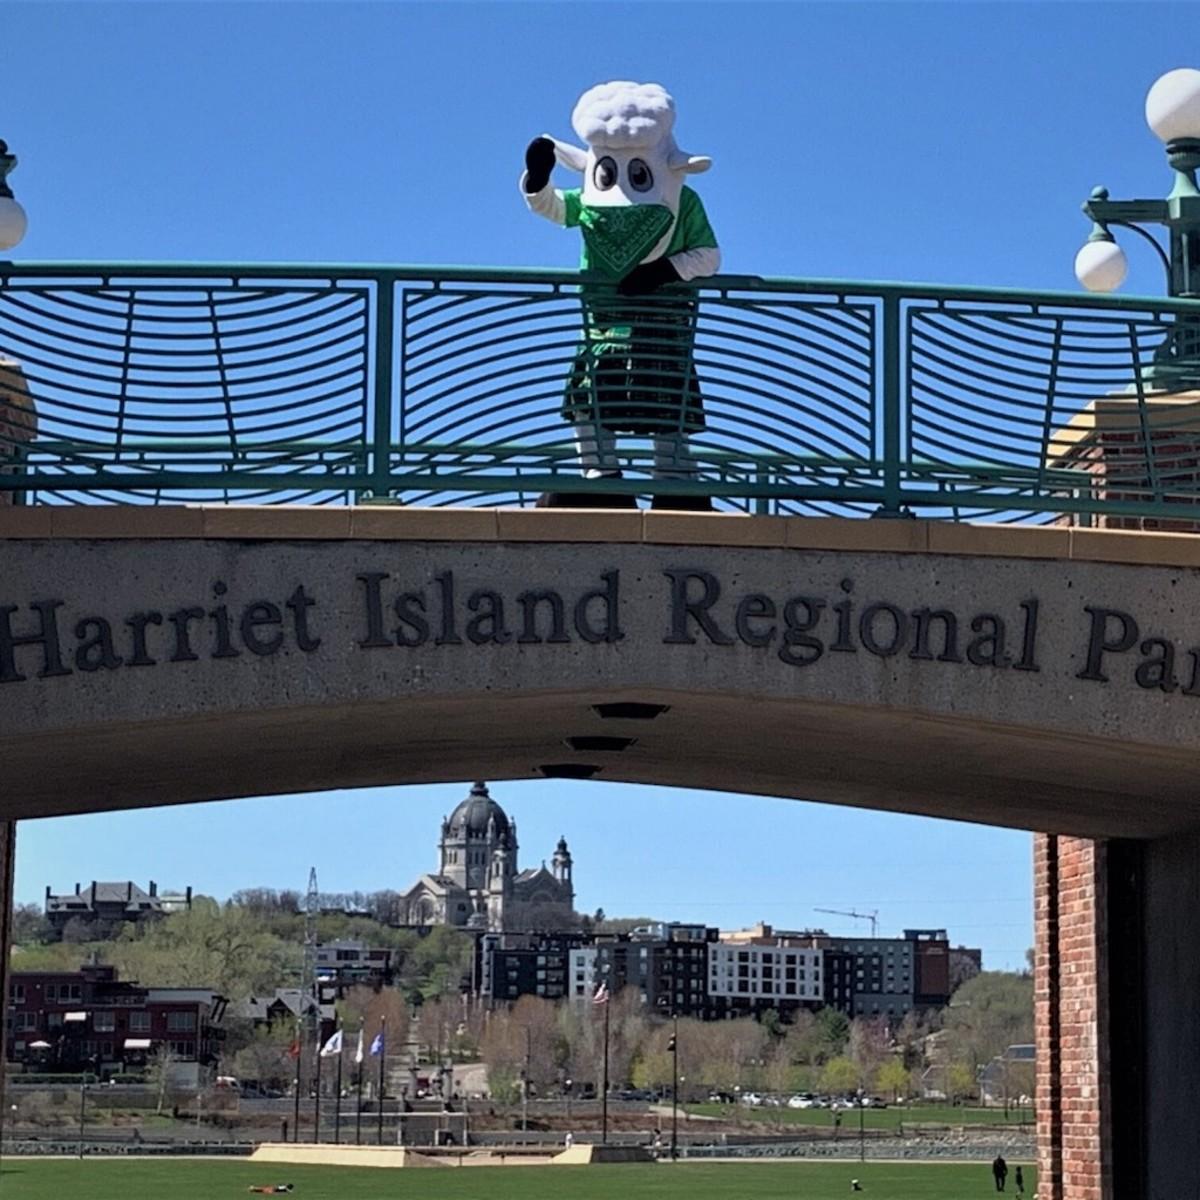 The Irish Fair of Minnesota's mascot wearing a face covering during the coronavirus pandemic.